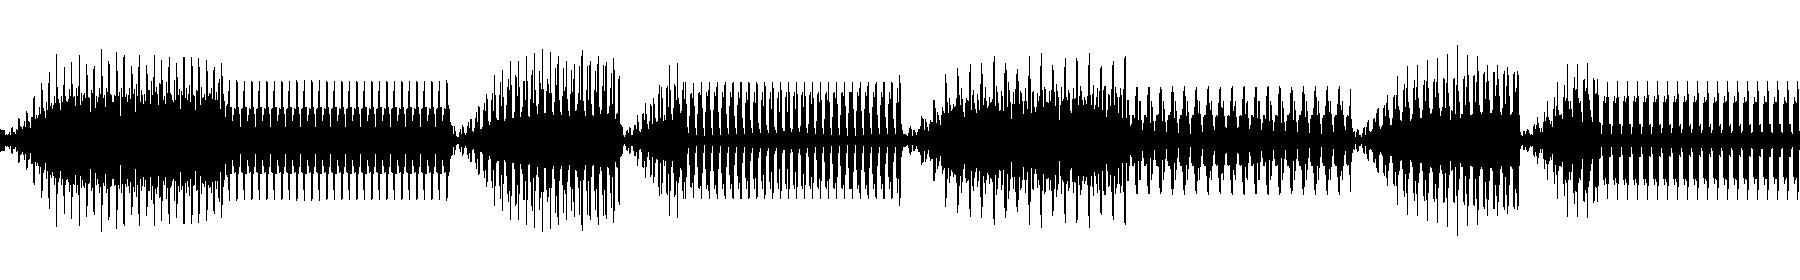 98 f pwmchords sp 01